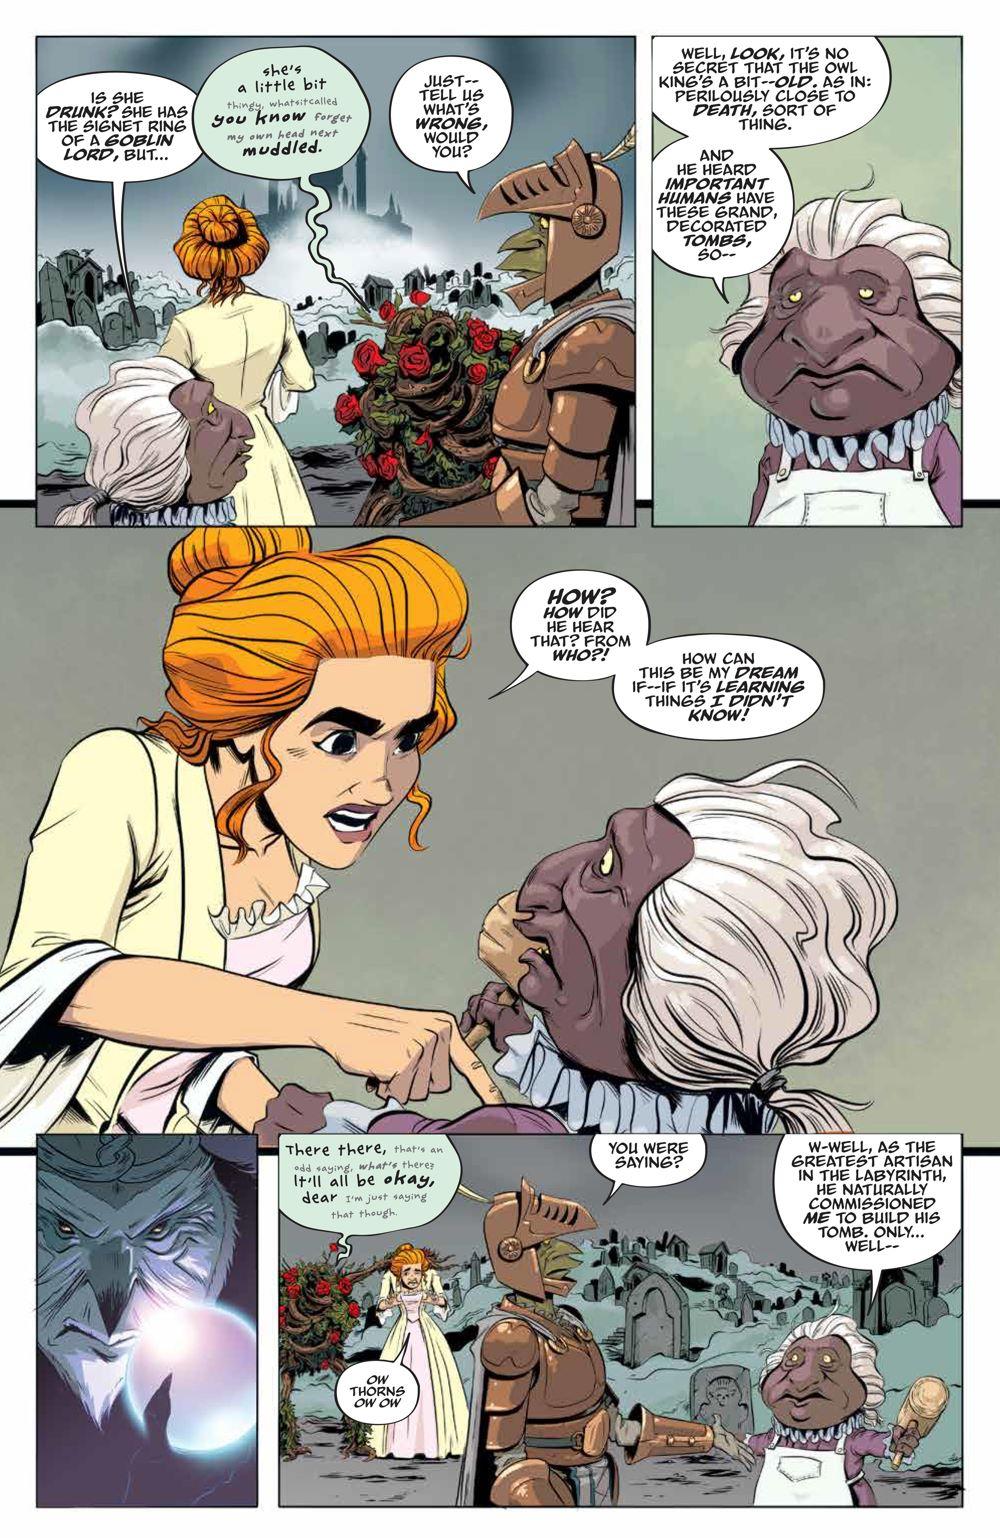 LabyrinthCoronation_v2_SC_PRESS_17 ComicList Previews: JIM HENSON'S LABYRINTH CORONATION VOLUME 2 TP